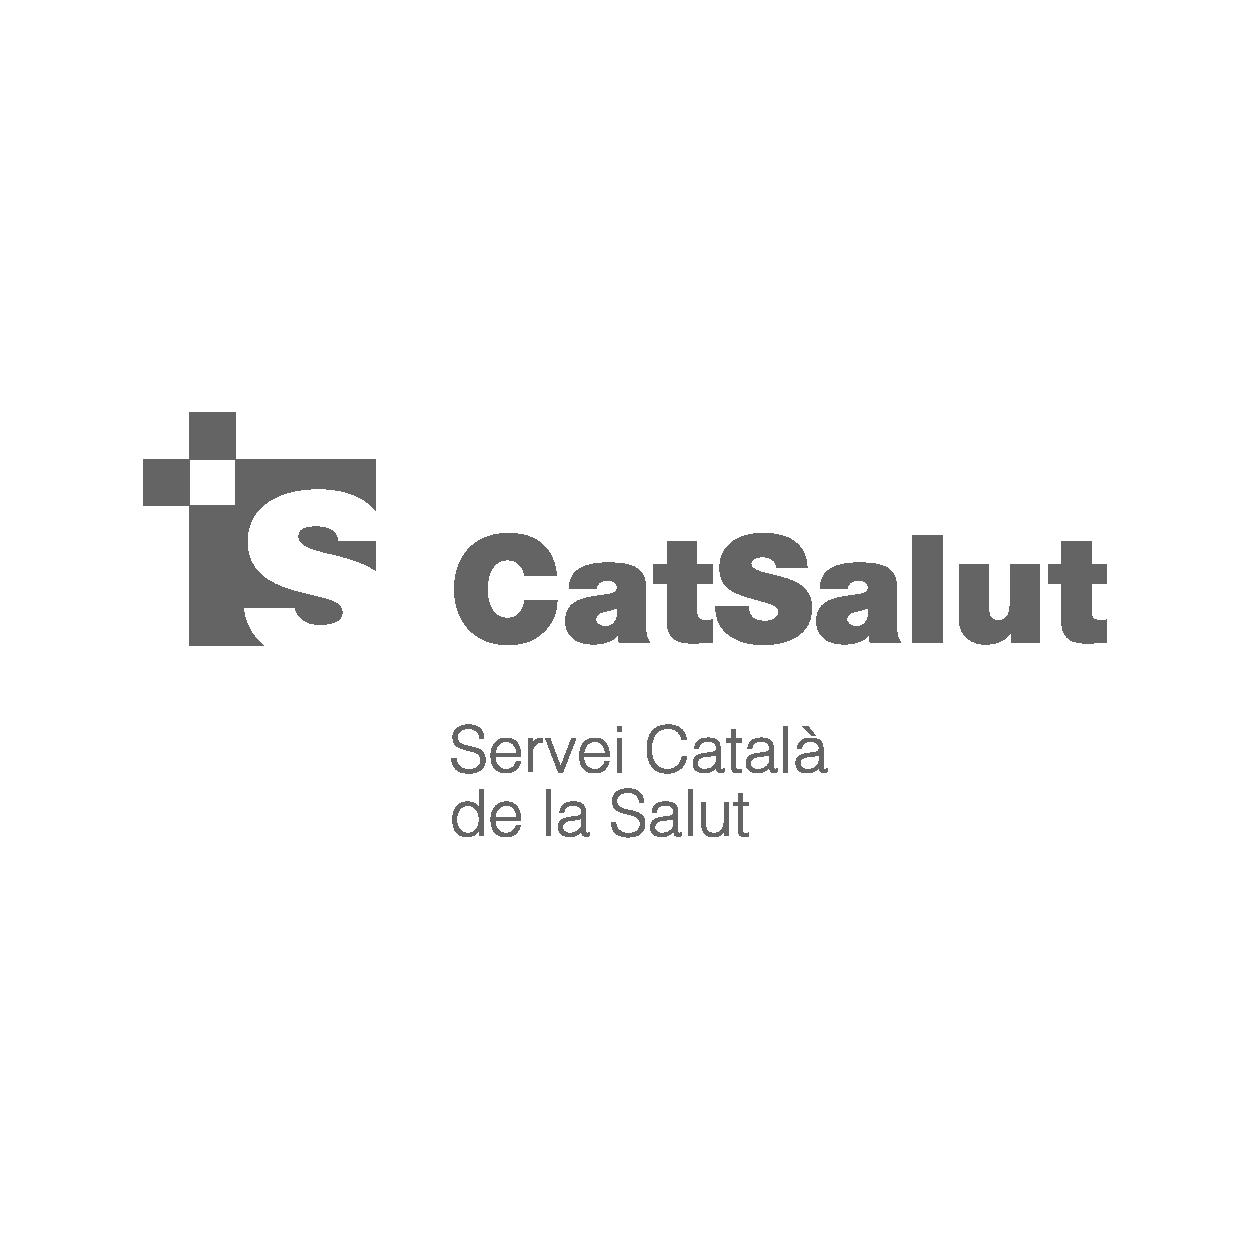 logo_Catsalut.png